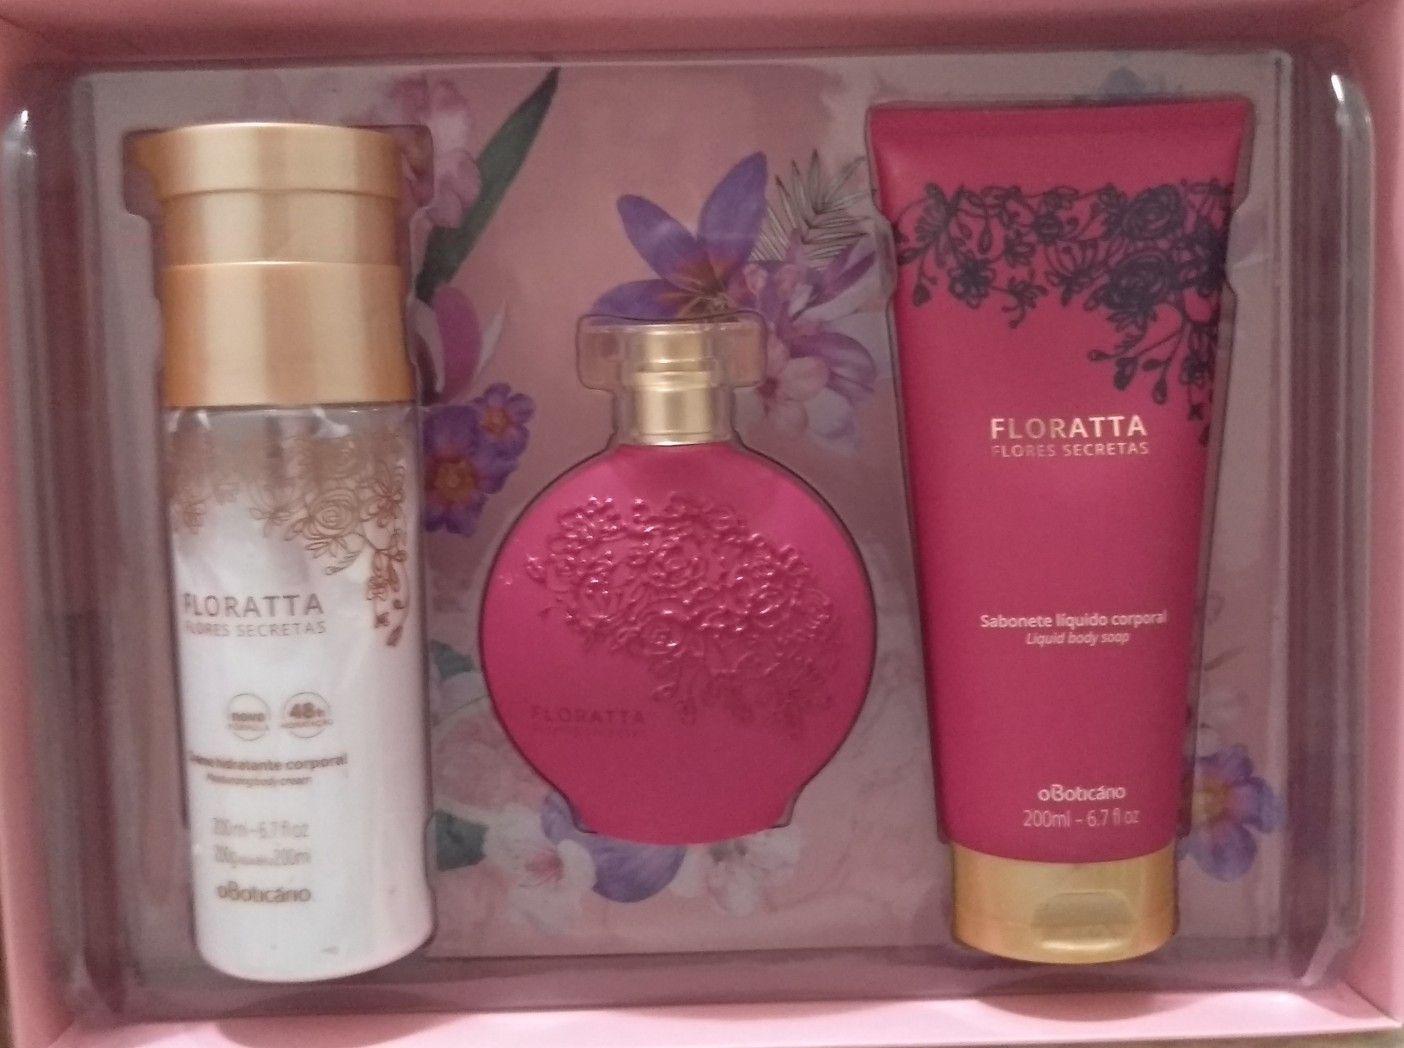 Kit Floratta Flores Secretas O Boticario Perfumaria E Cosmeticos Floratta Boticario Boticario